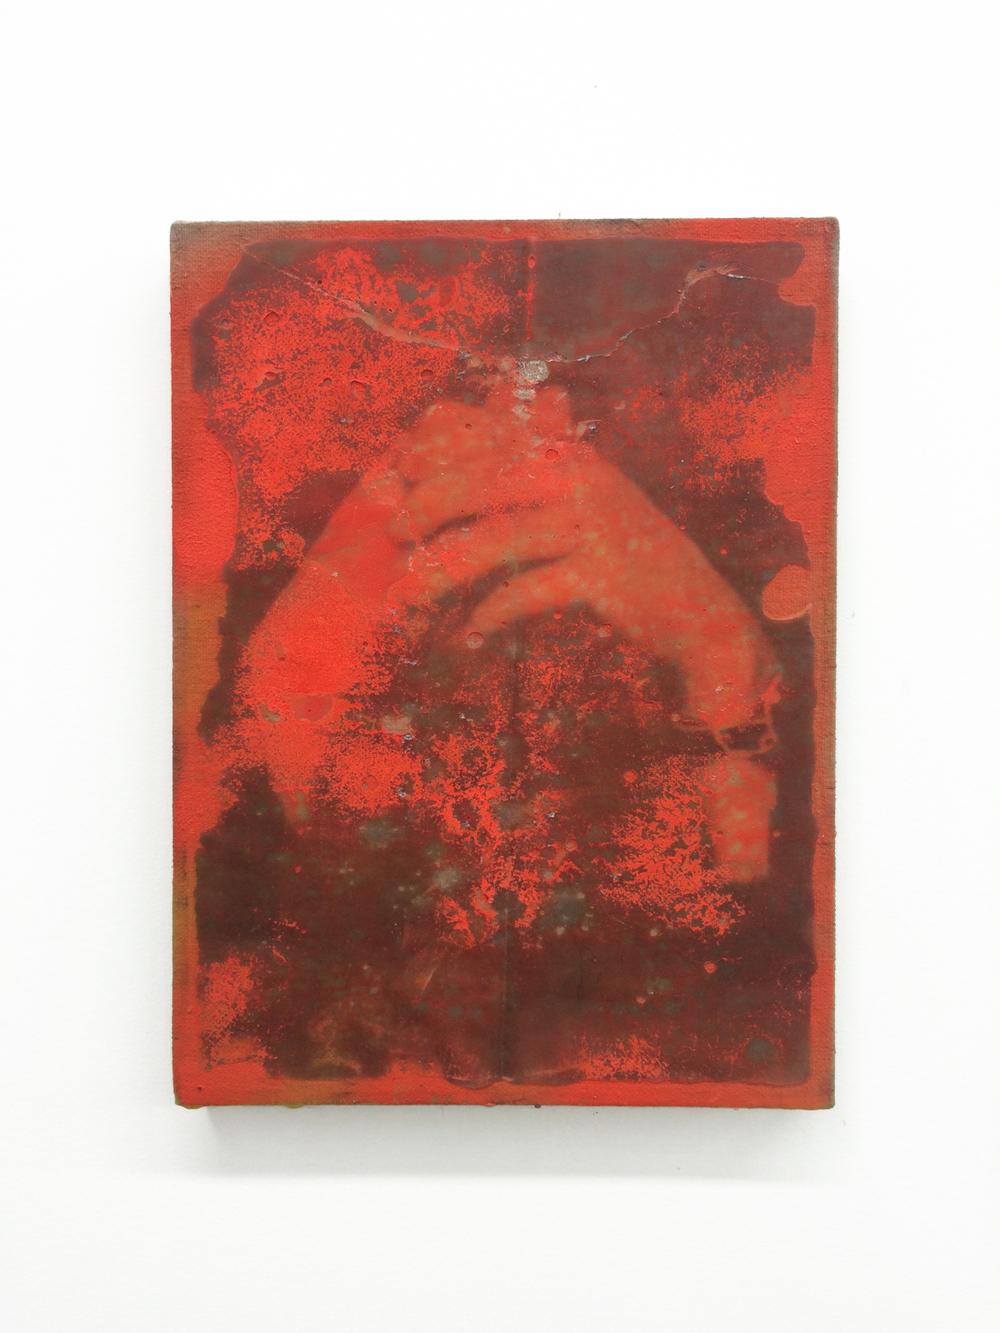 JPW3, G.H., 2015 spray paint, ink wax transfer